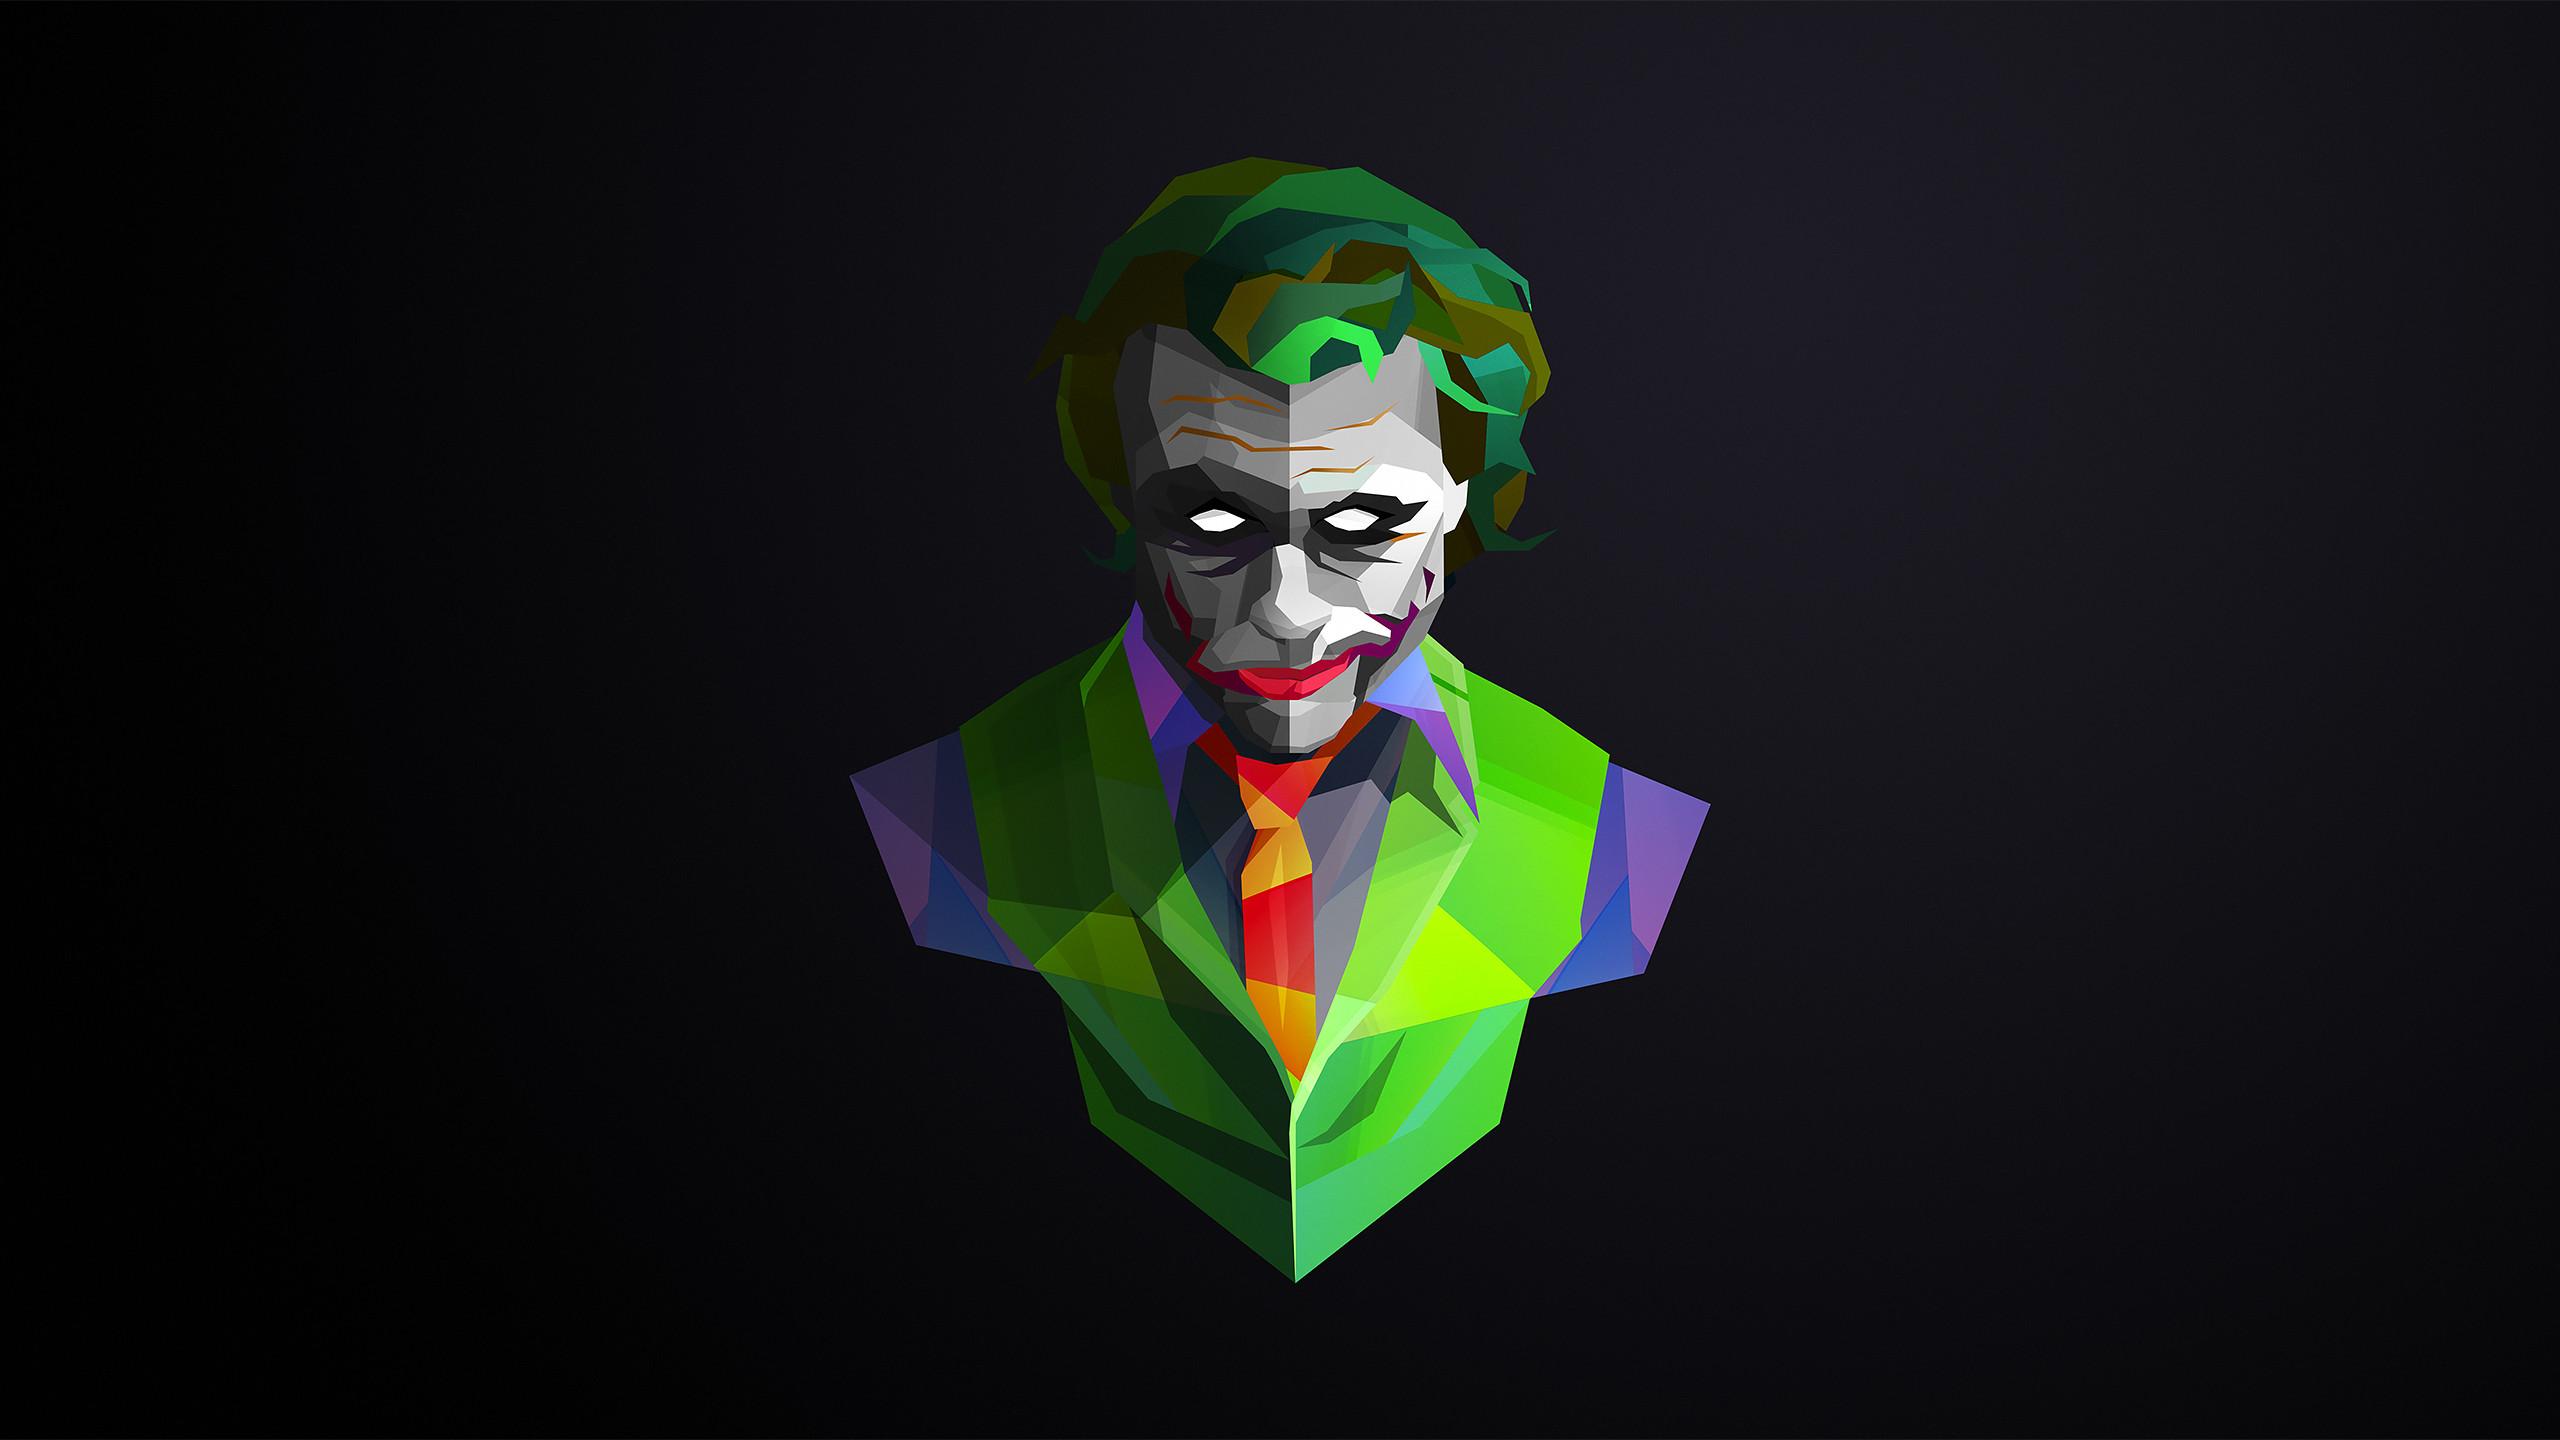 Joker Justin Maller